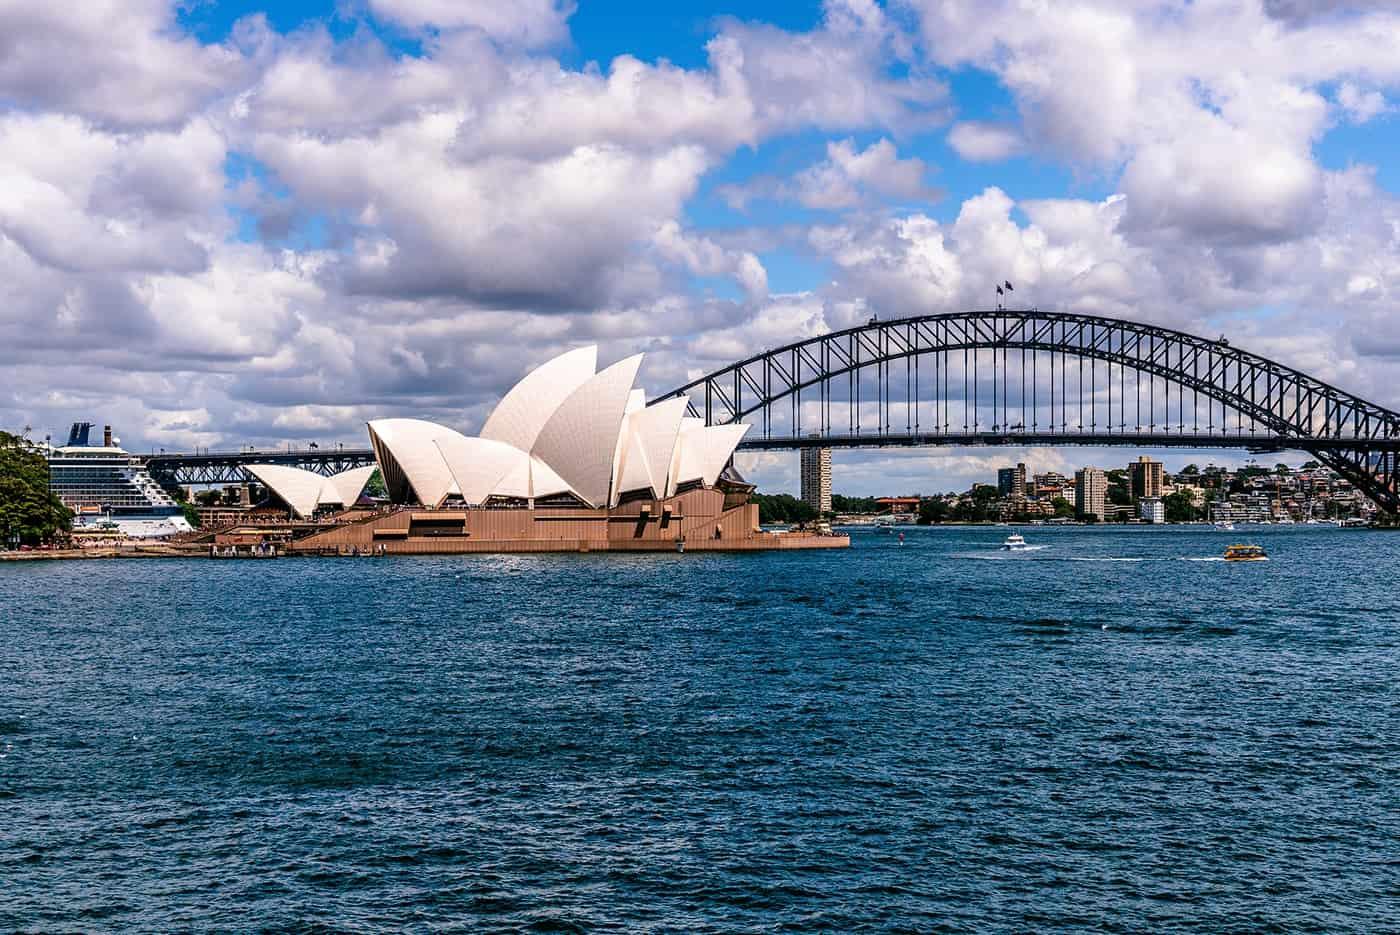 Remembering Australia mesothelioma victims